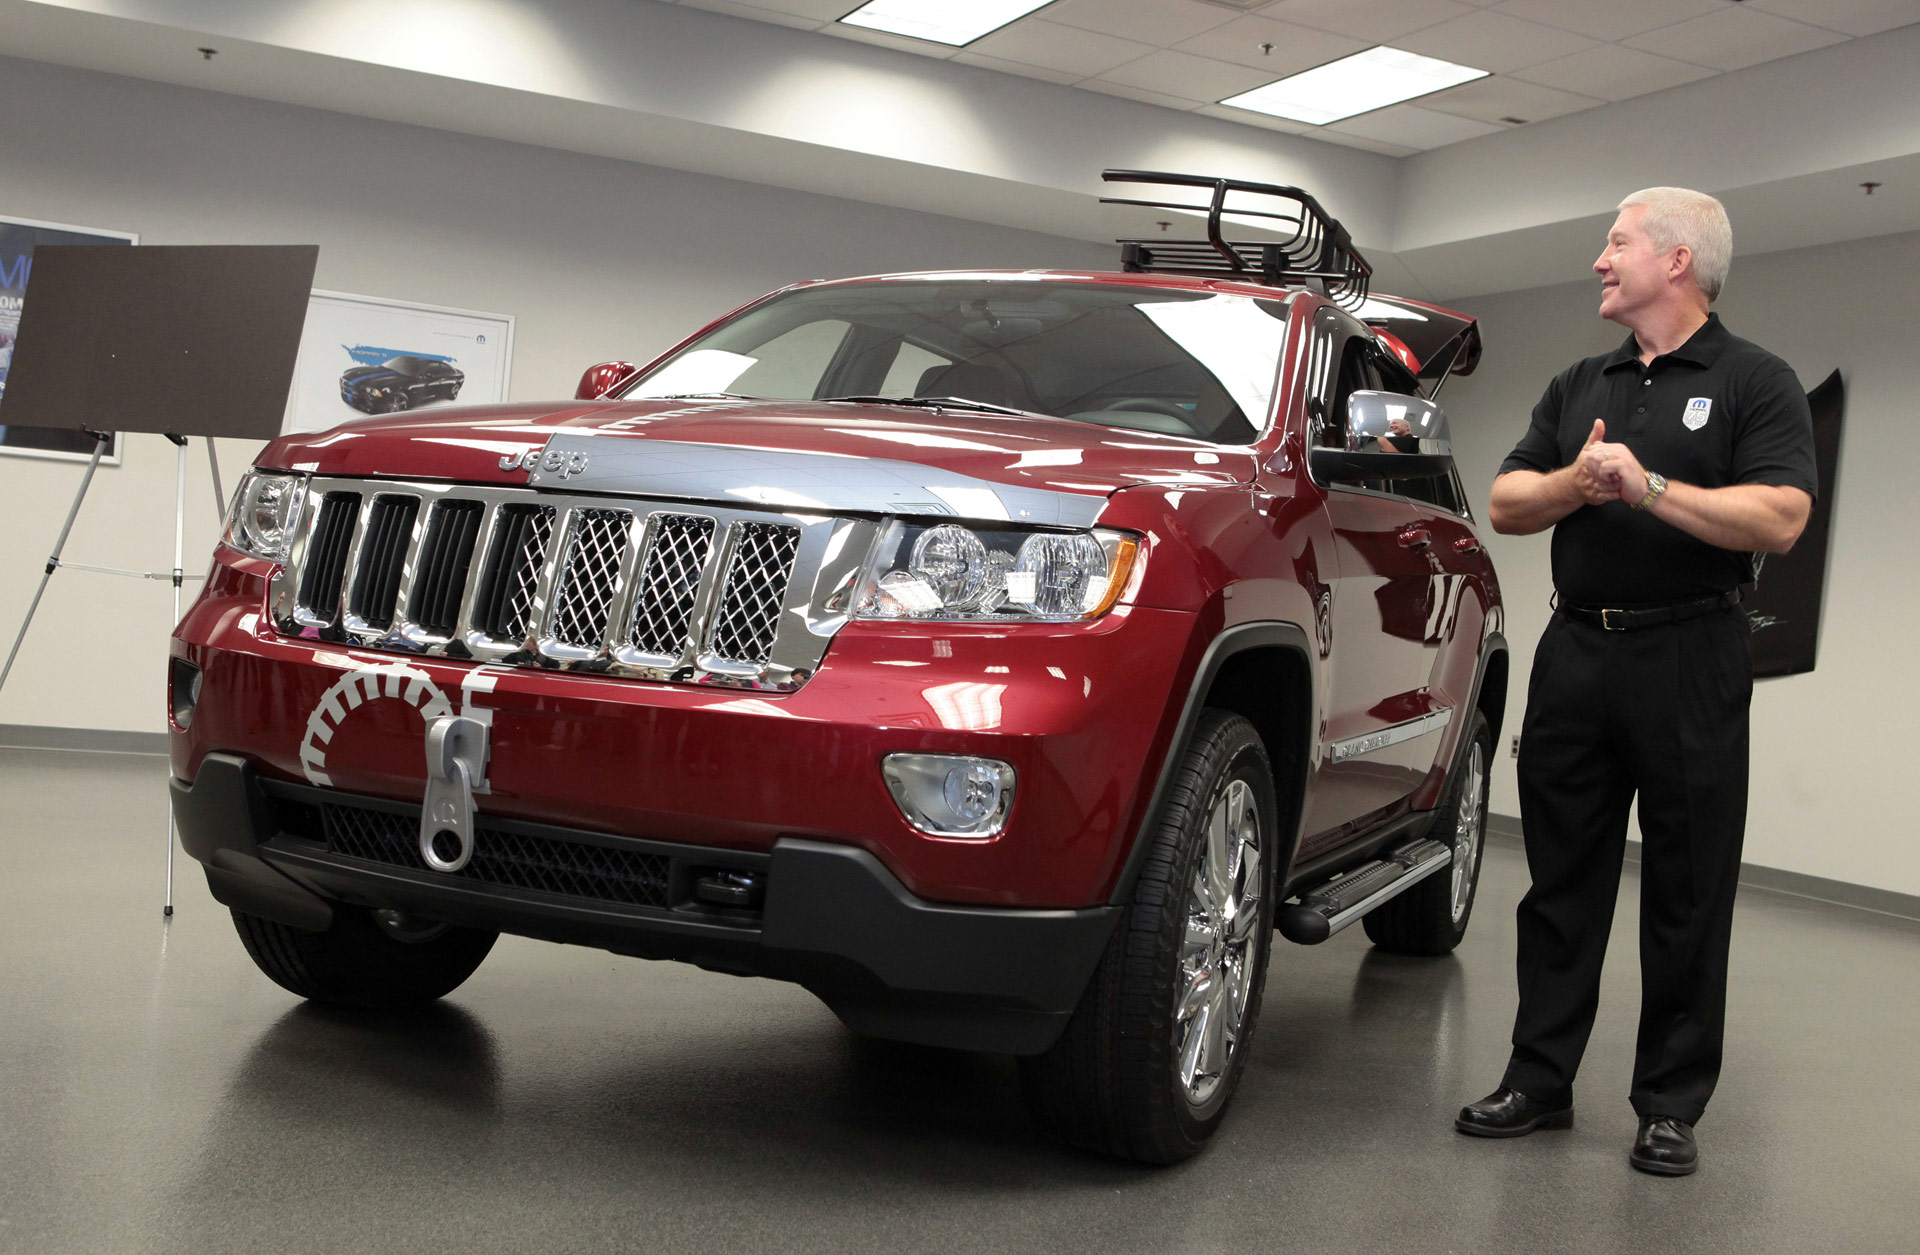 2012 jeep grand cherokee half half conceptcarzcom